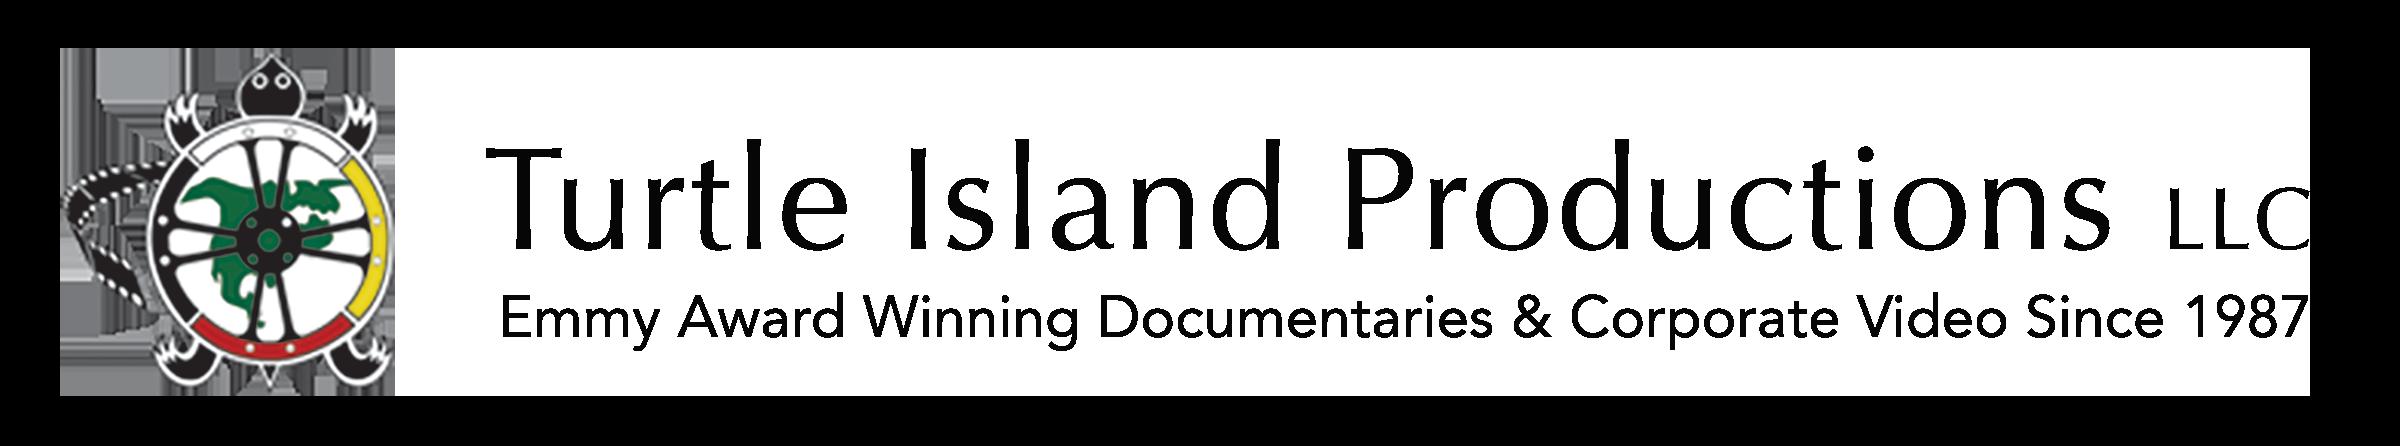 Turtle Island Productions LLC